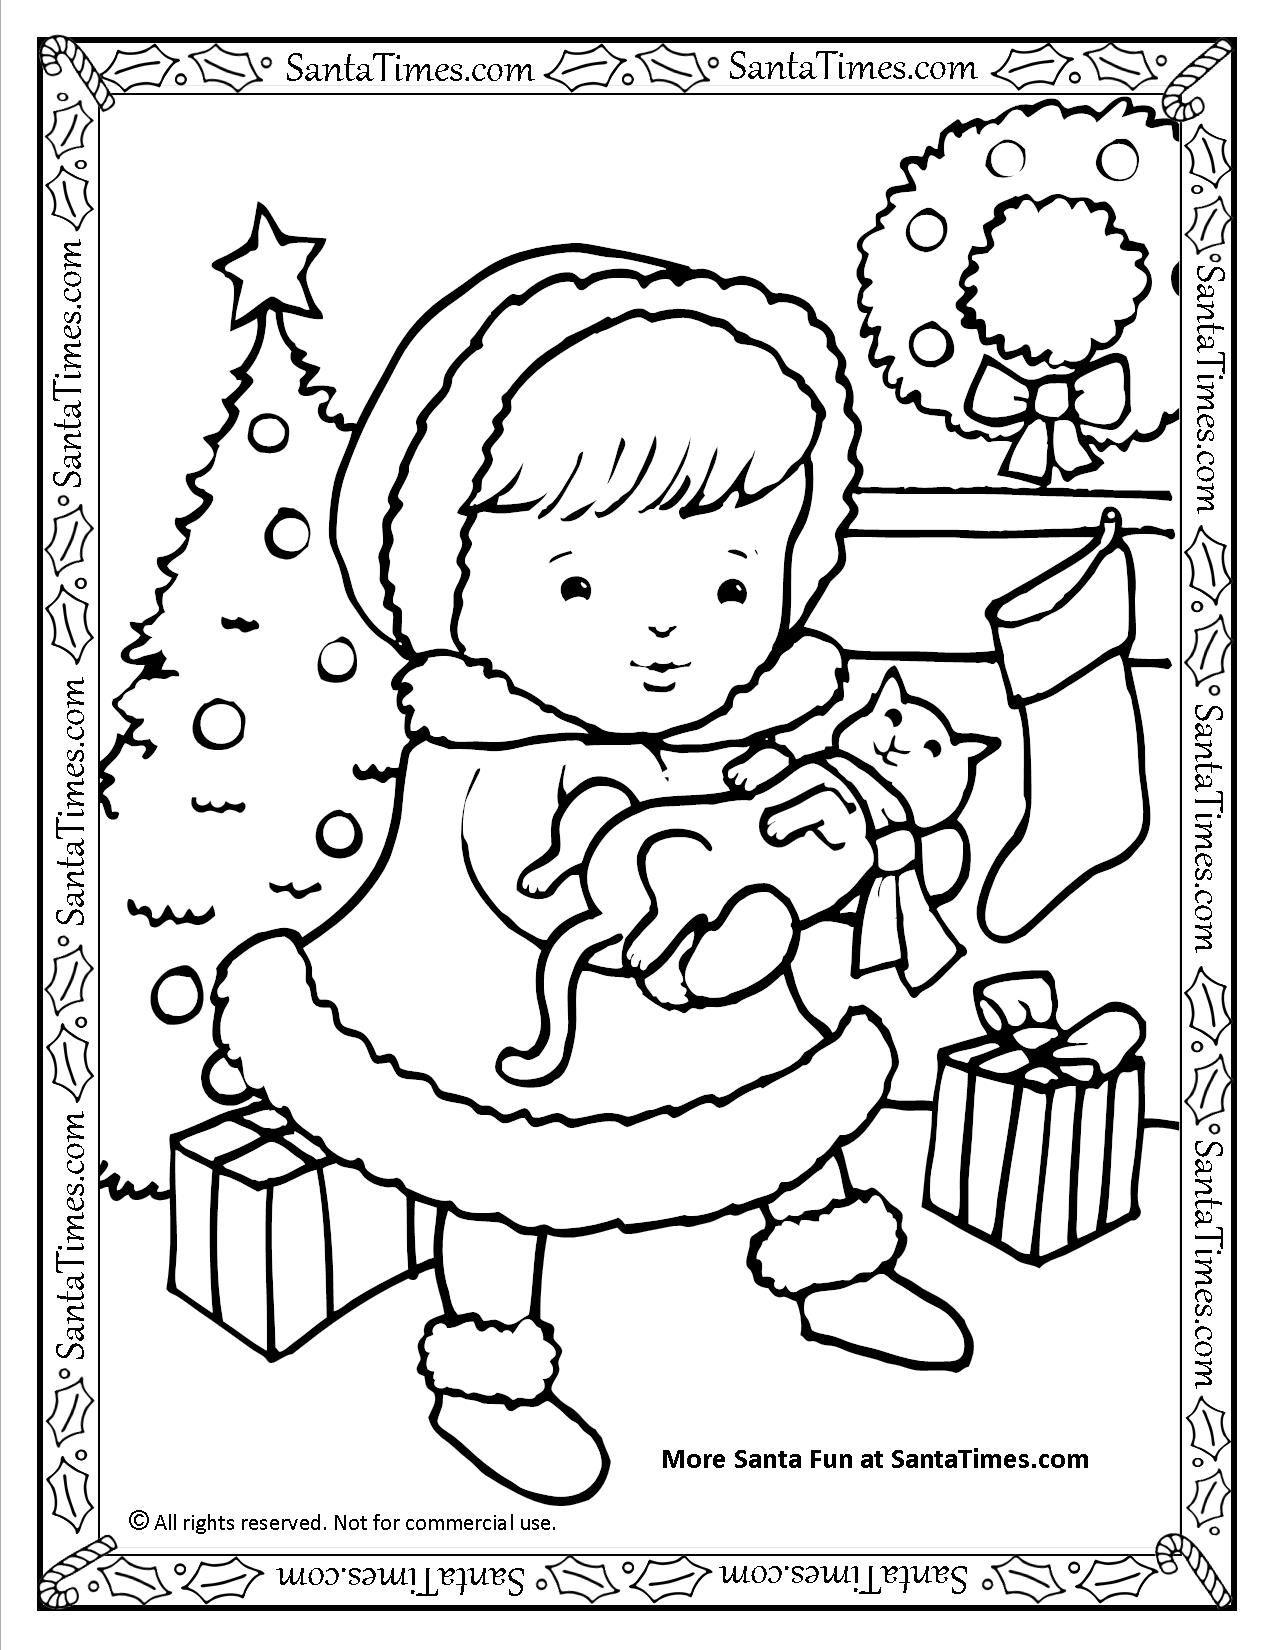 Merry Christmas Kitty Printable Coloring Page More Fun